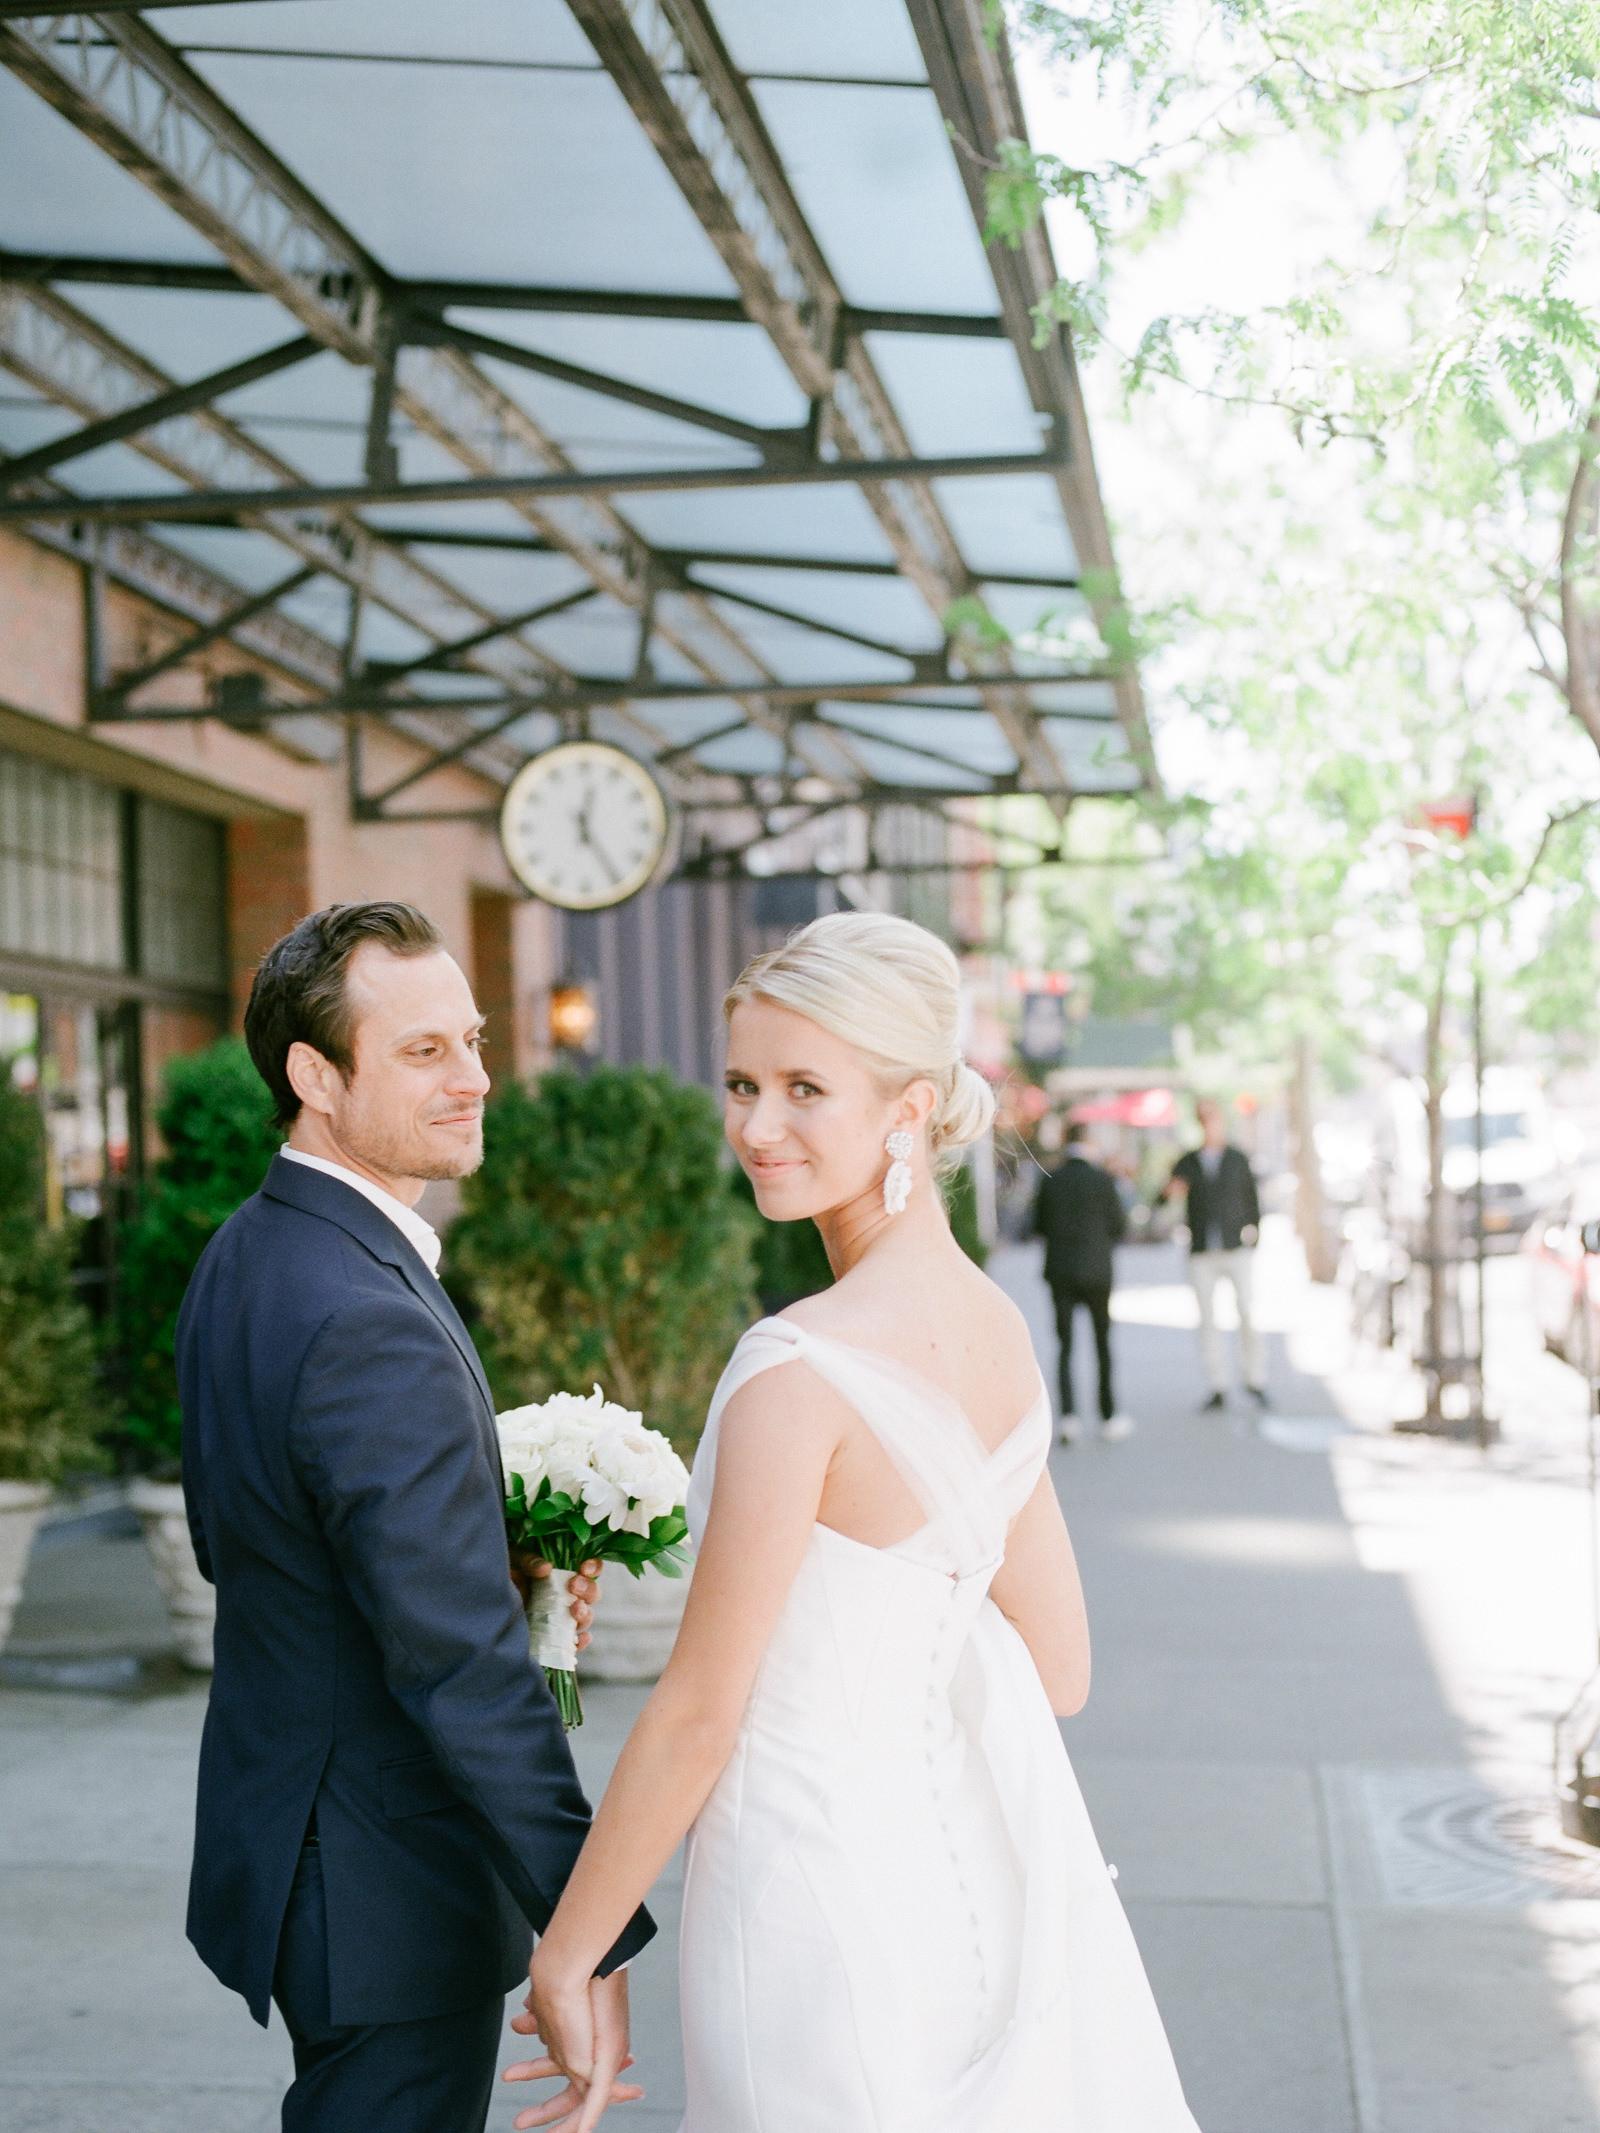 Intimate-NYC_wedding_ by Tanya Isaeva-94.jpg